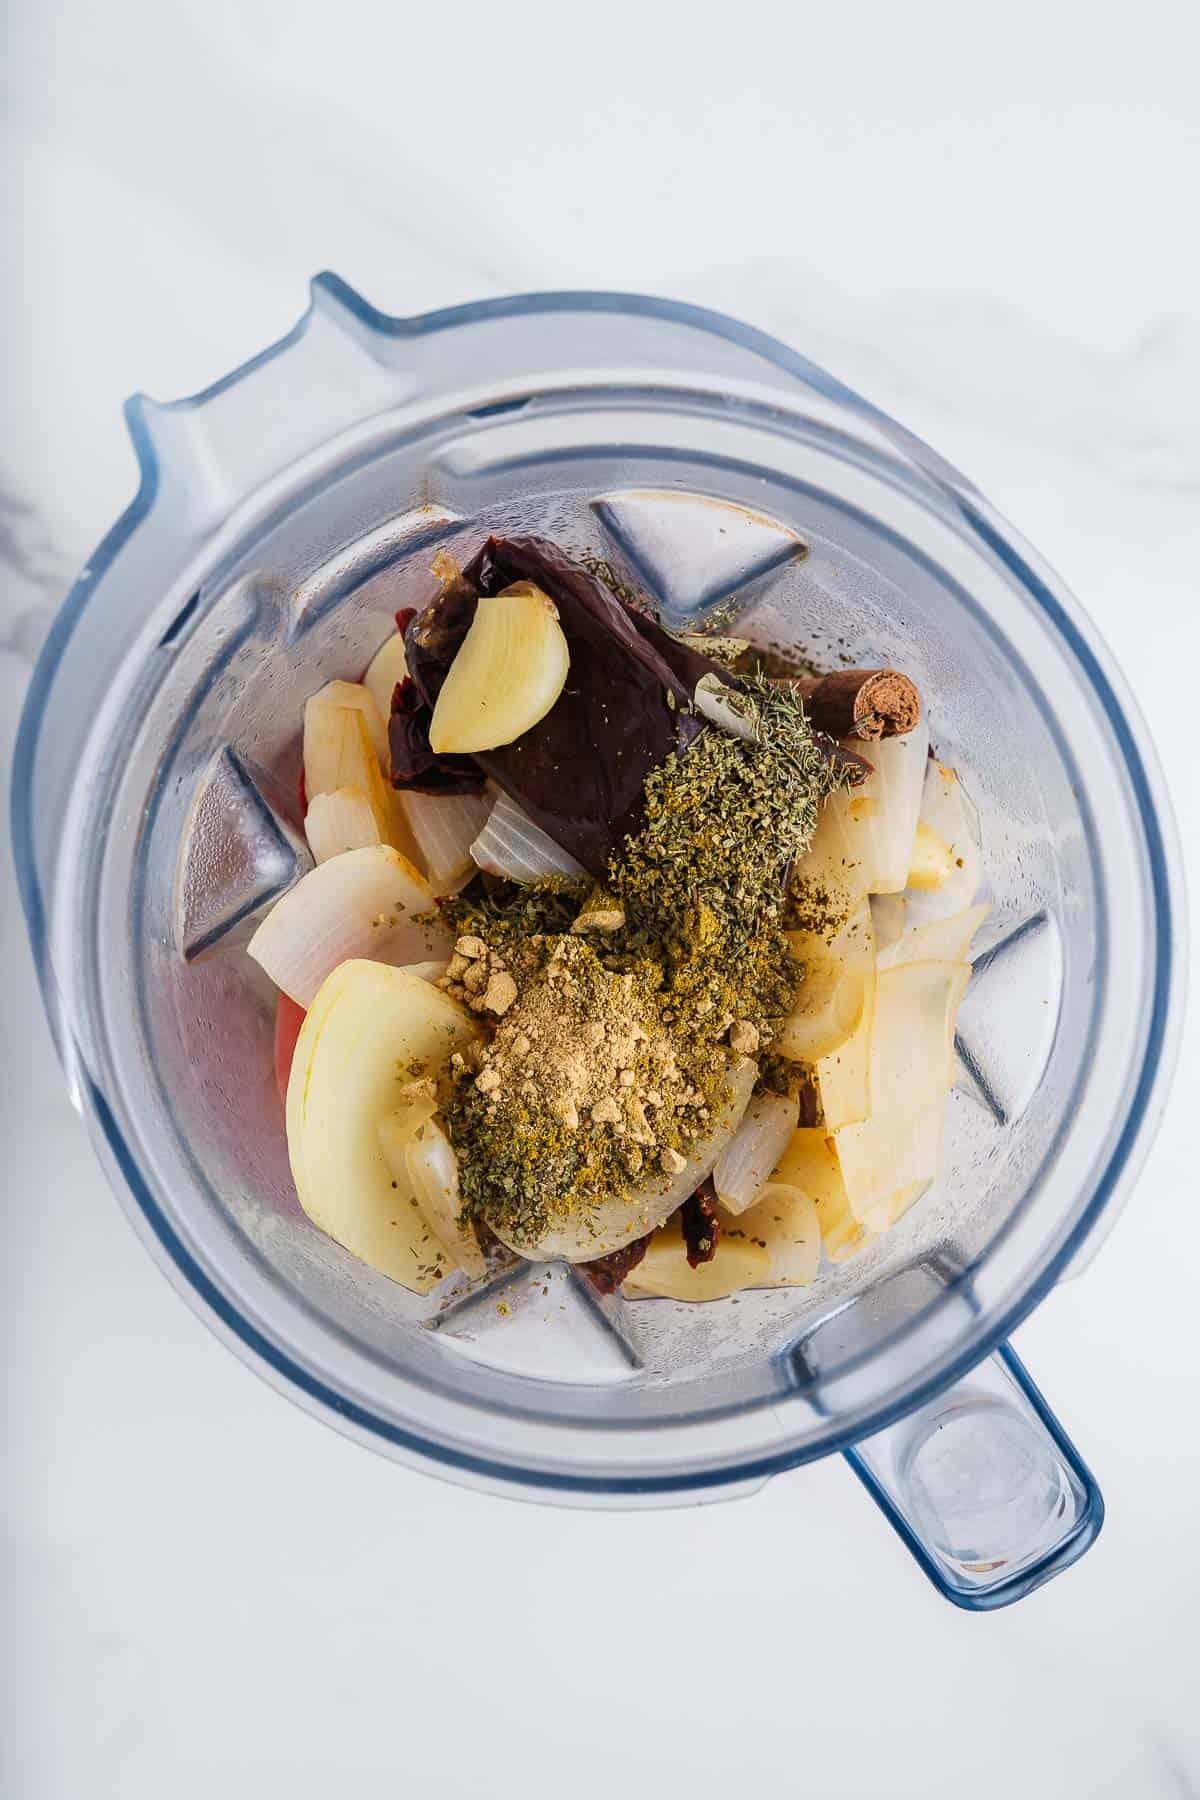 Vegetables, Chiles, and Seasonings in a Blender